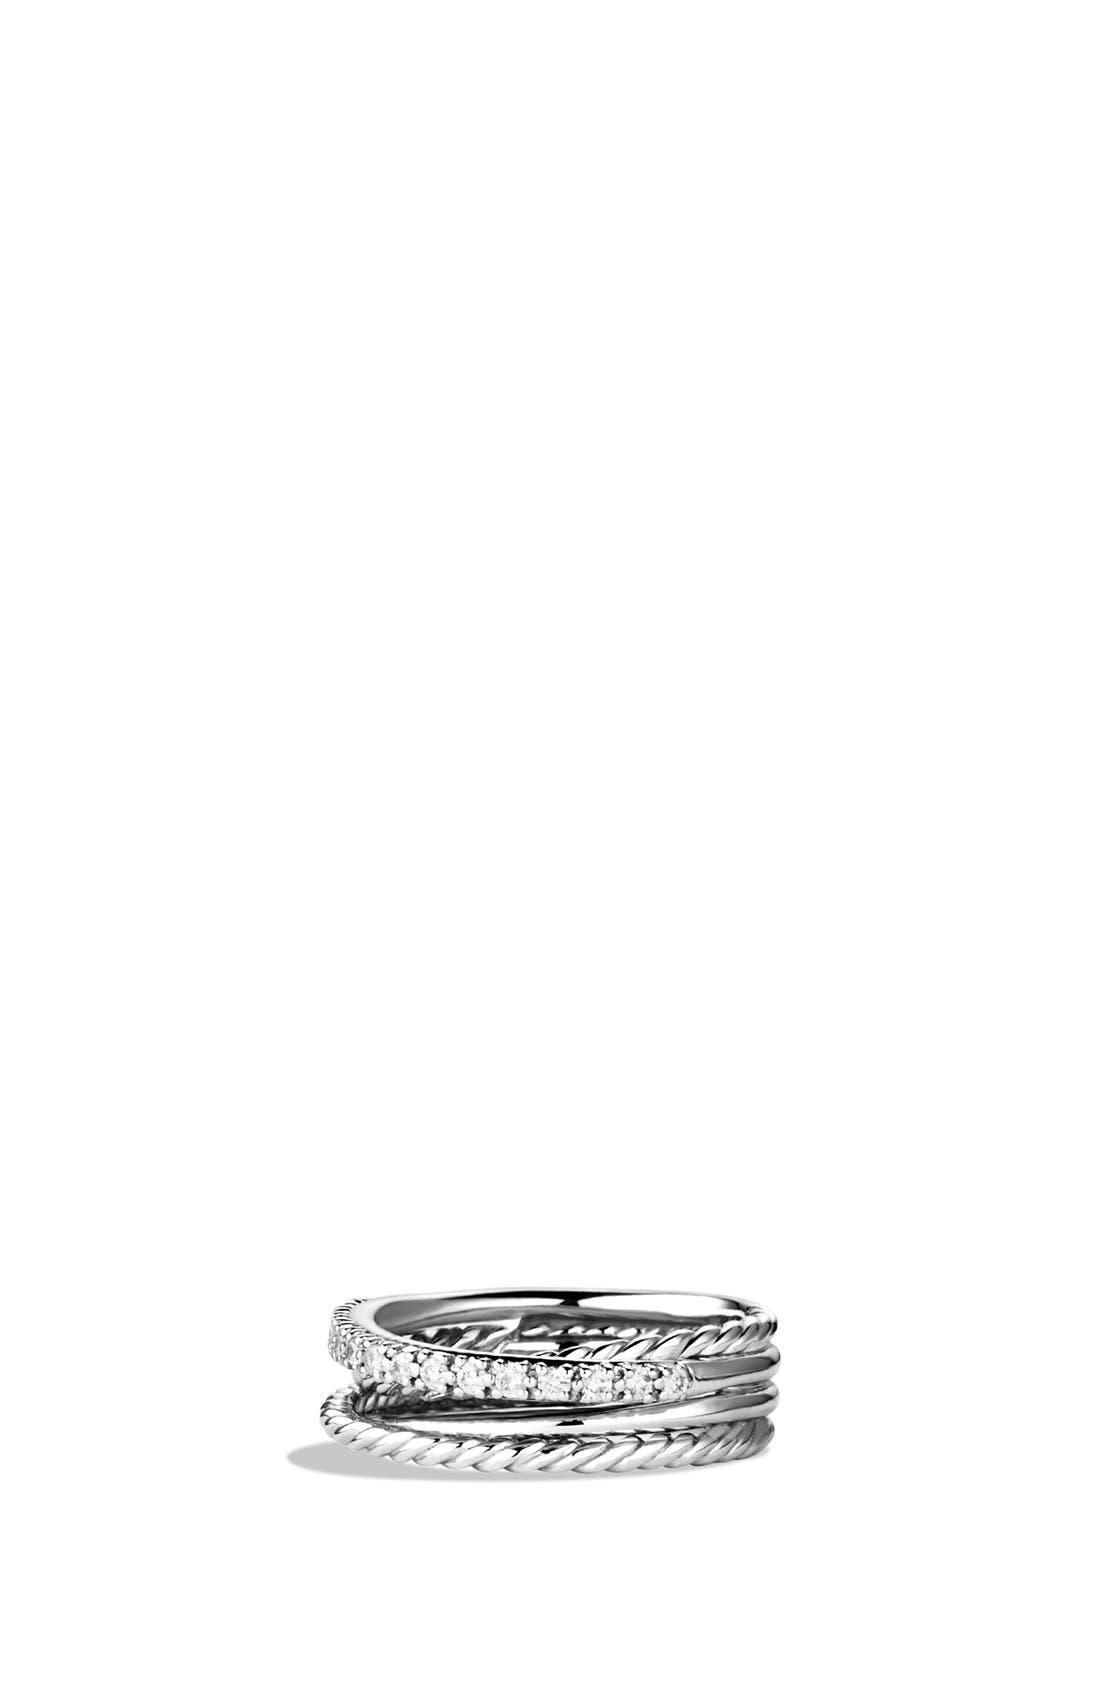 'Crossover' Ring with Diamonds,                         Main,                         color, Silver/ Diamond